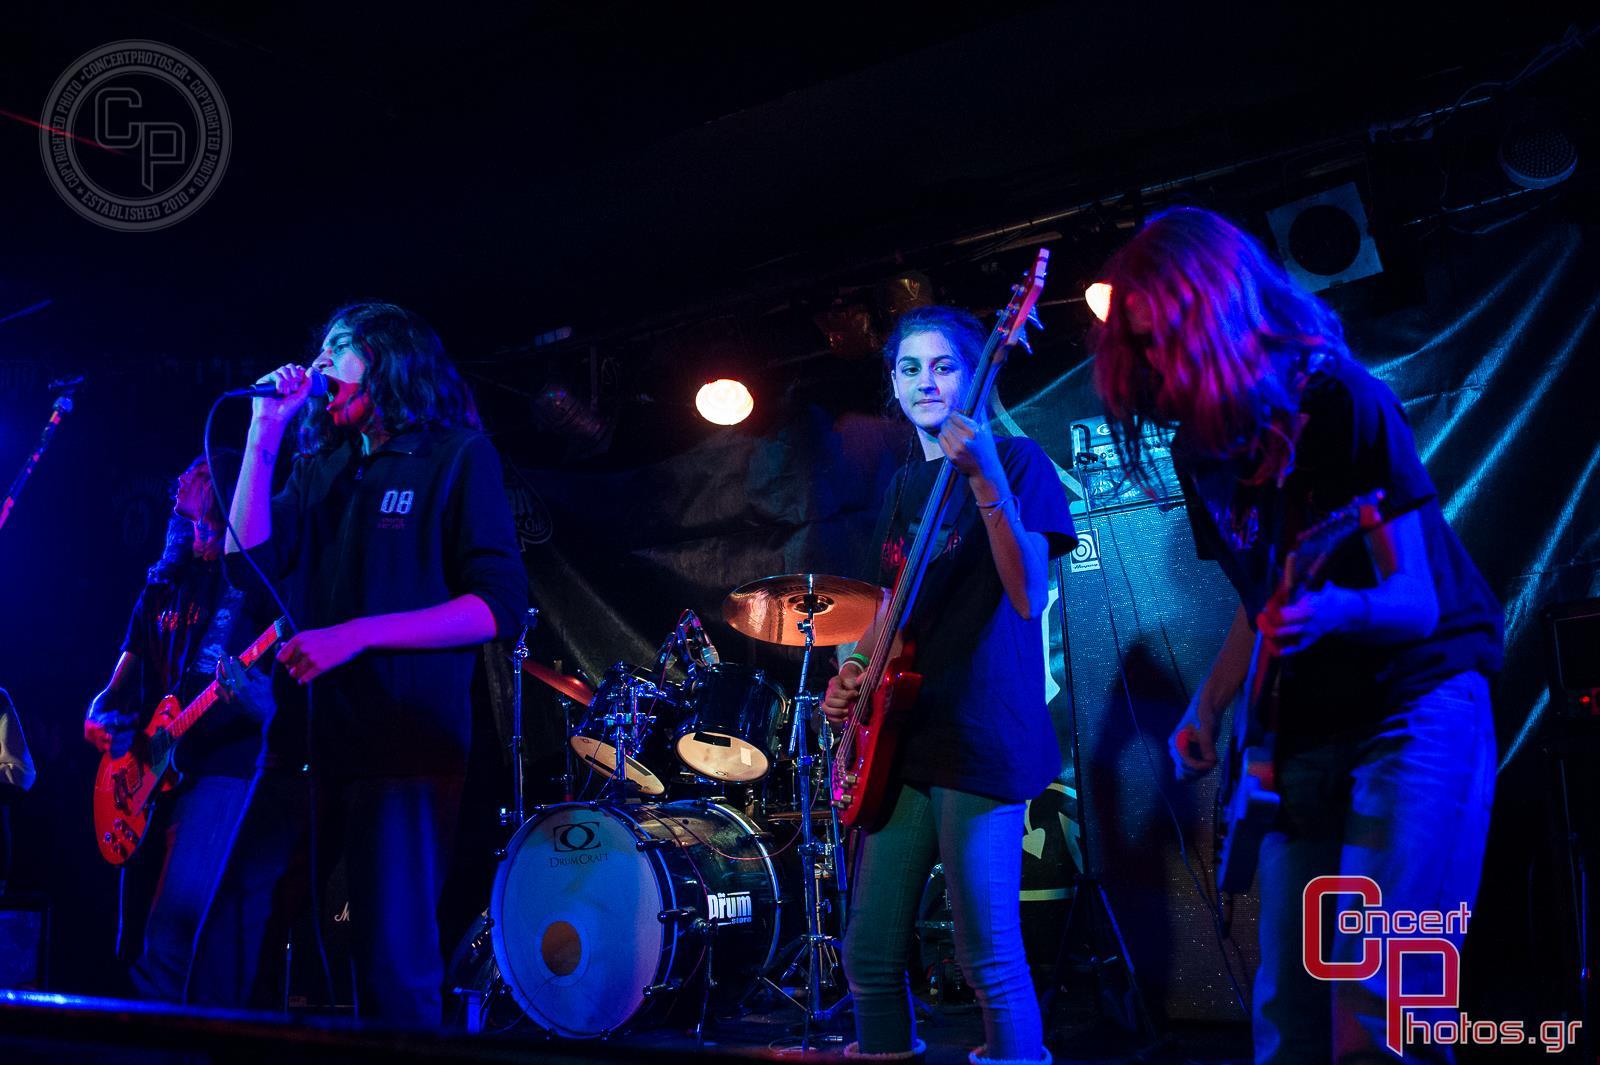 Battle Of The Bands Leg 1-Battle Of The Bands Leg 1 photographer:  - ConcertPhotos - 20141126_2257_52